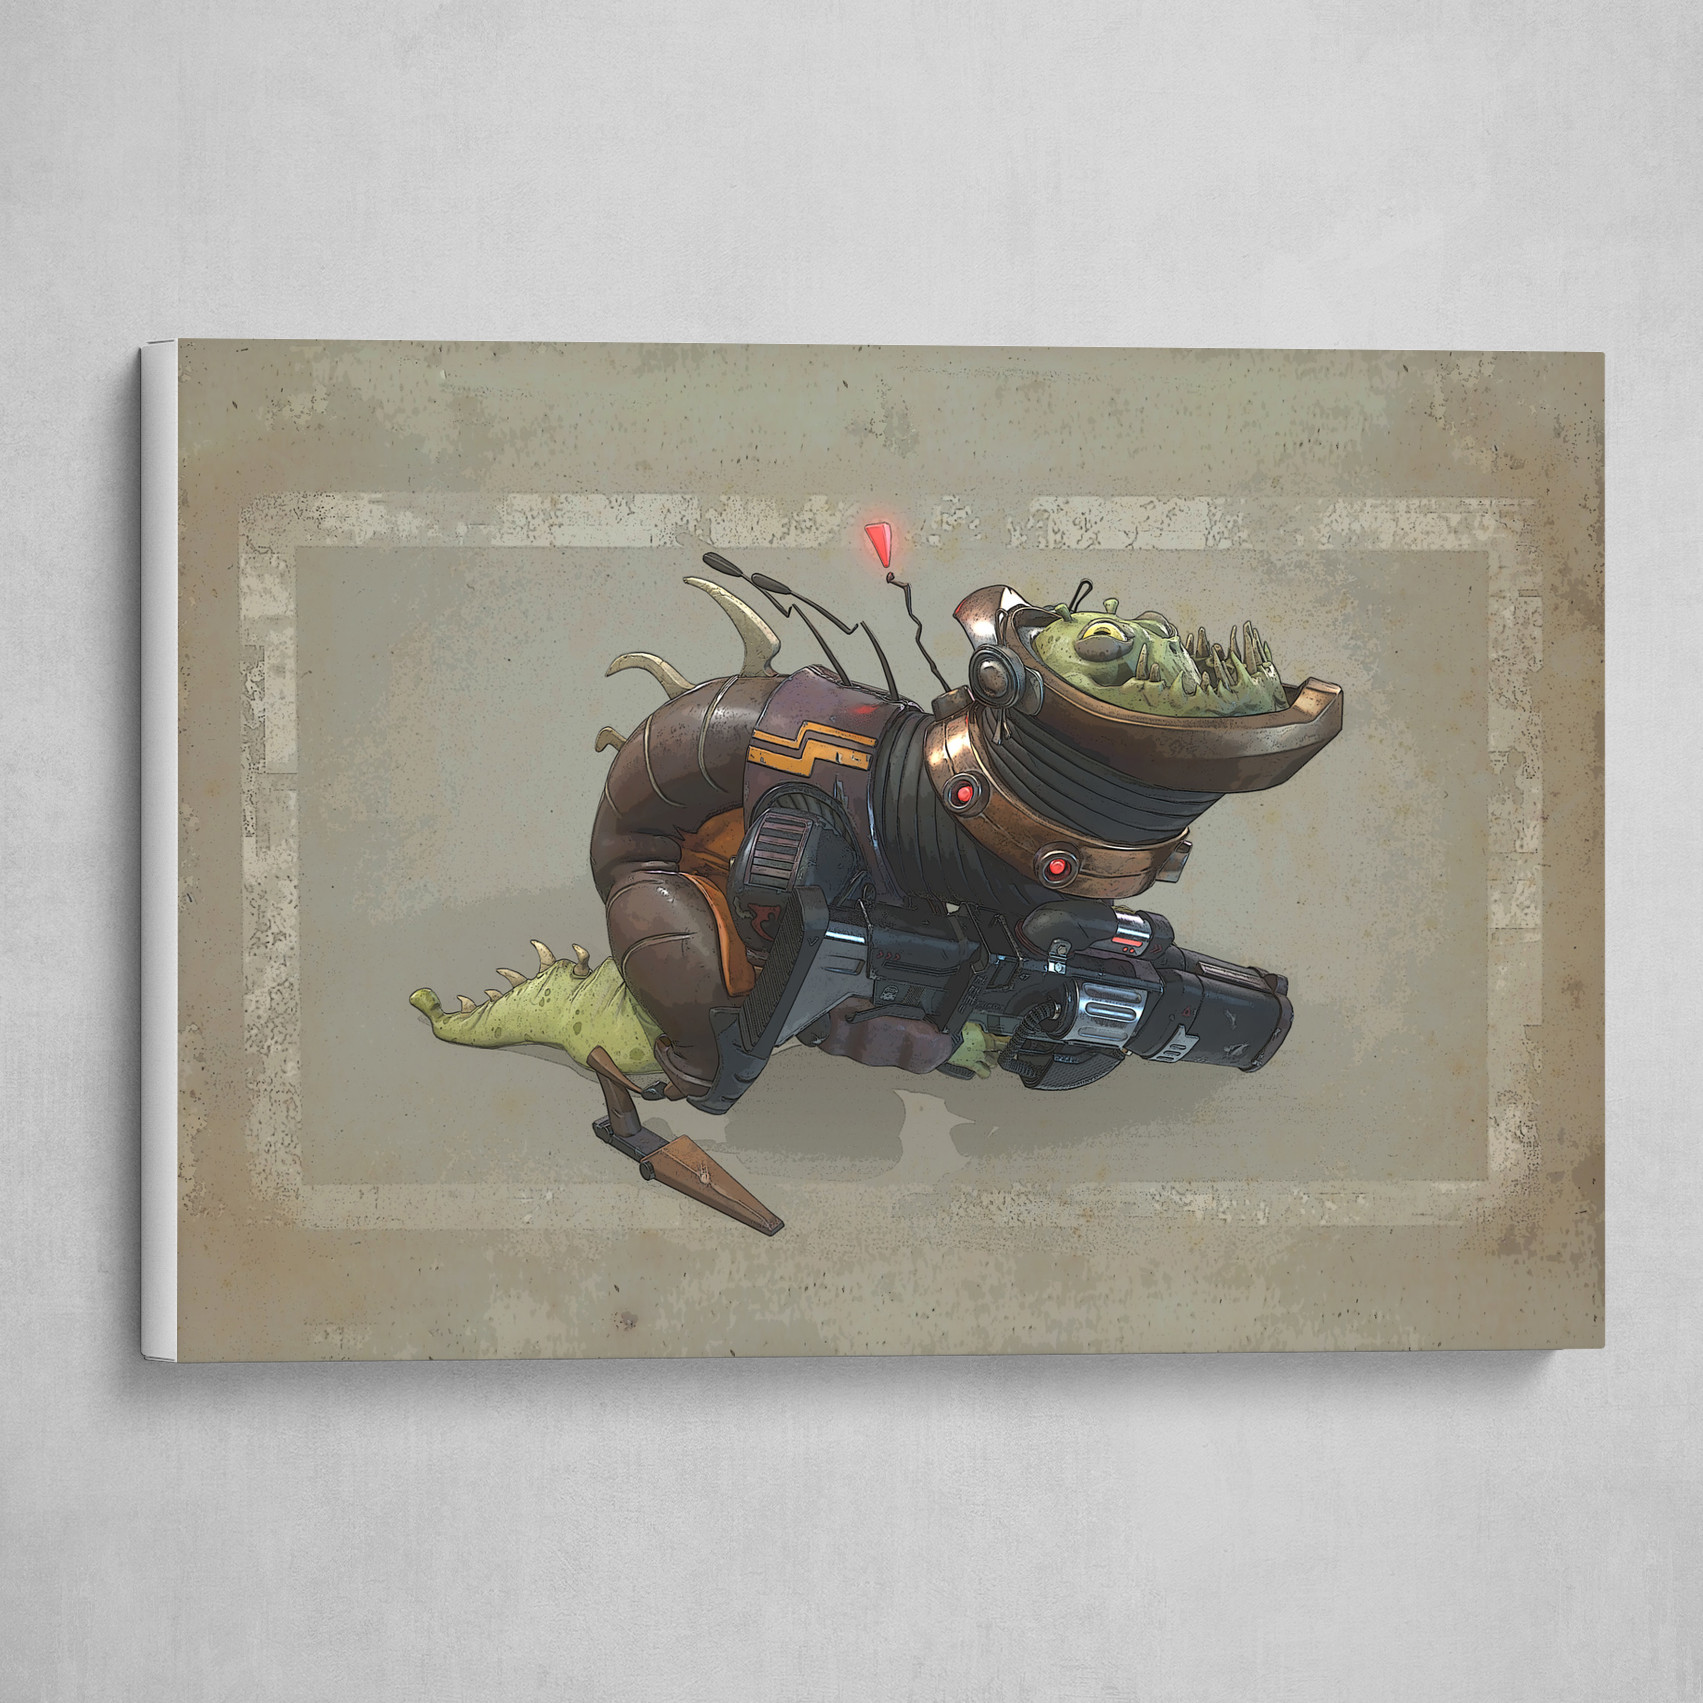 Stylized Sci-Fi Lizard Creature (with gun)